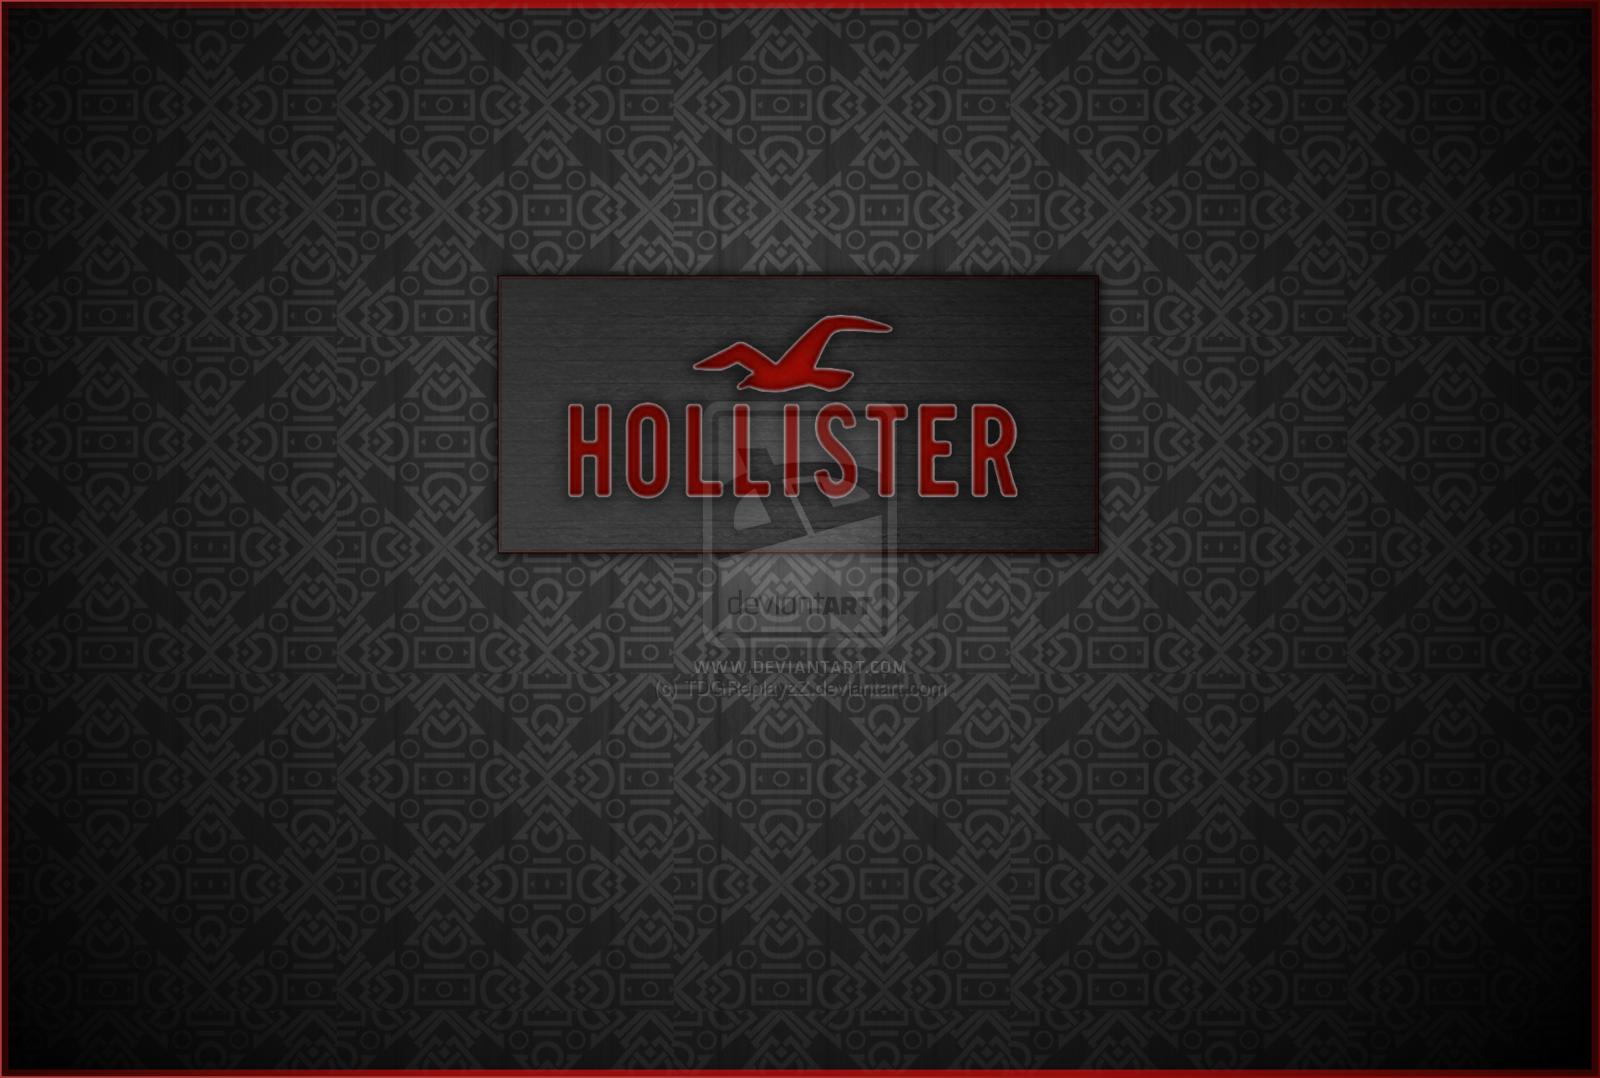 hollister hd wallpaper 2012 by tdgreplayzz customization wallpaper 1600x1078